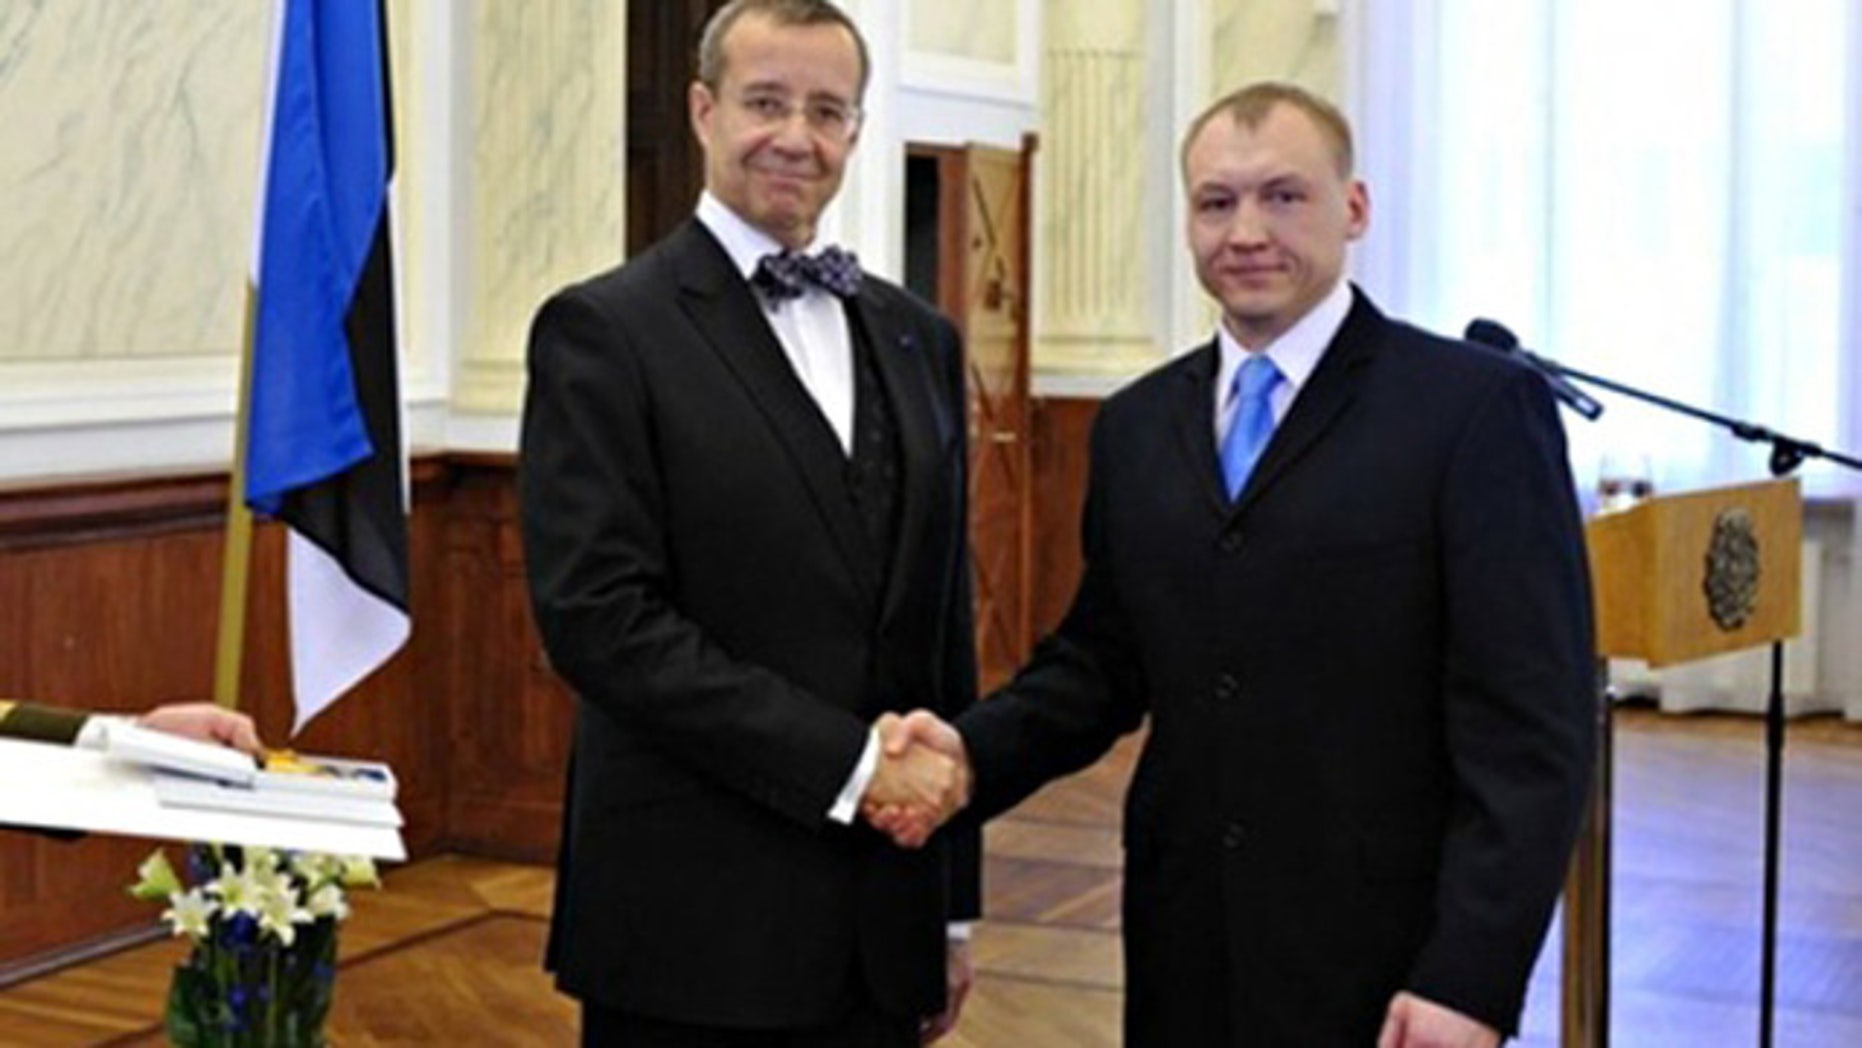 This 2010 photo shows Eston Kohver, right, receivning a decoration from Estonia's President Toomas Hendrik.